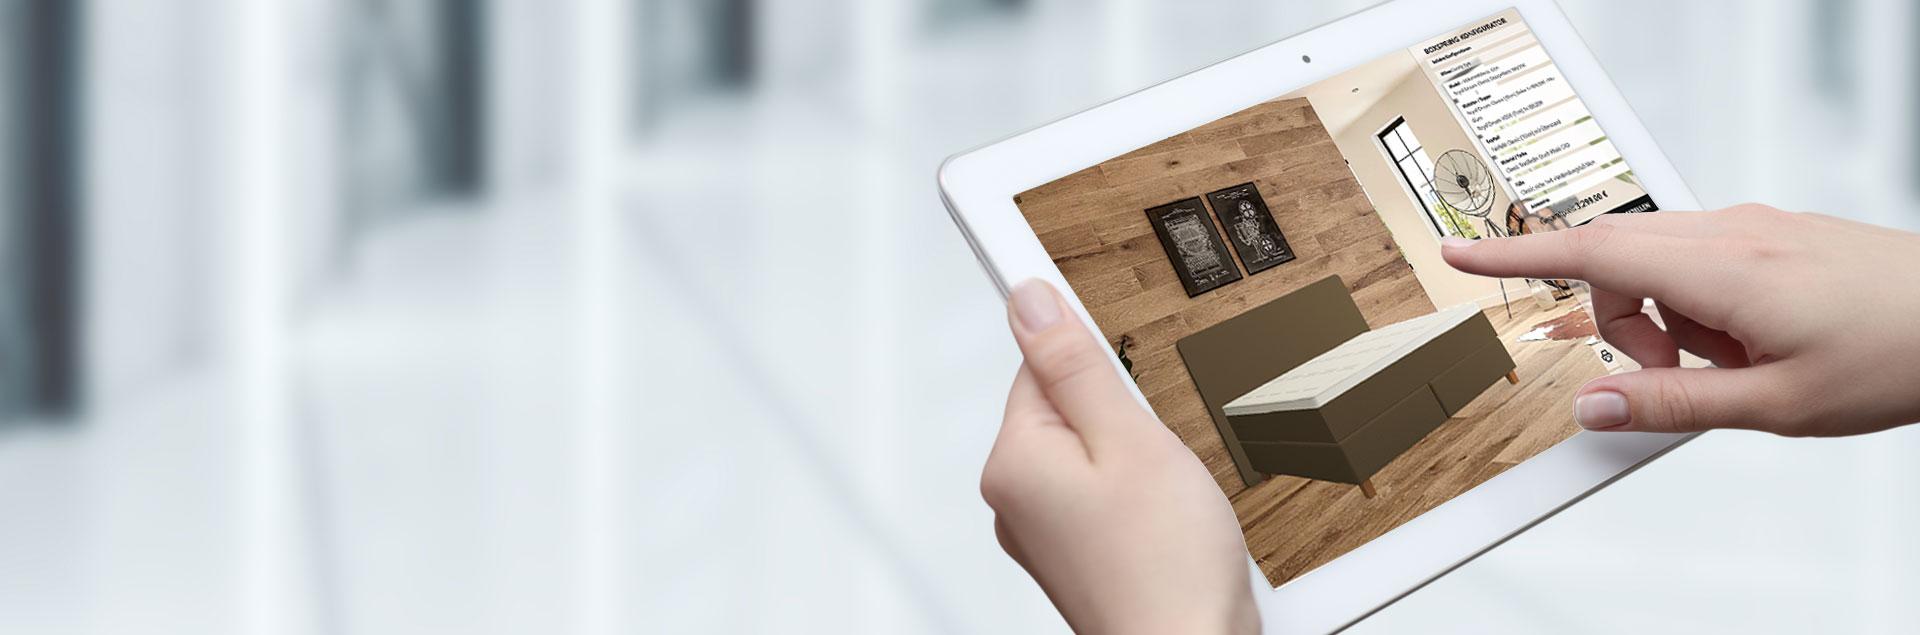 Digitaler POS - ABK Future Store